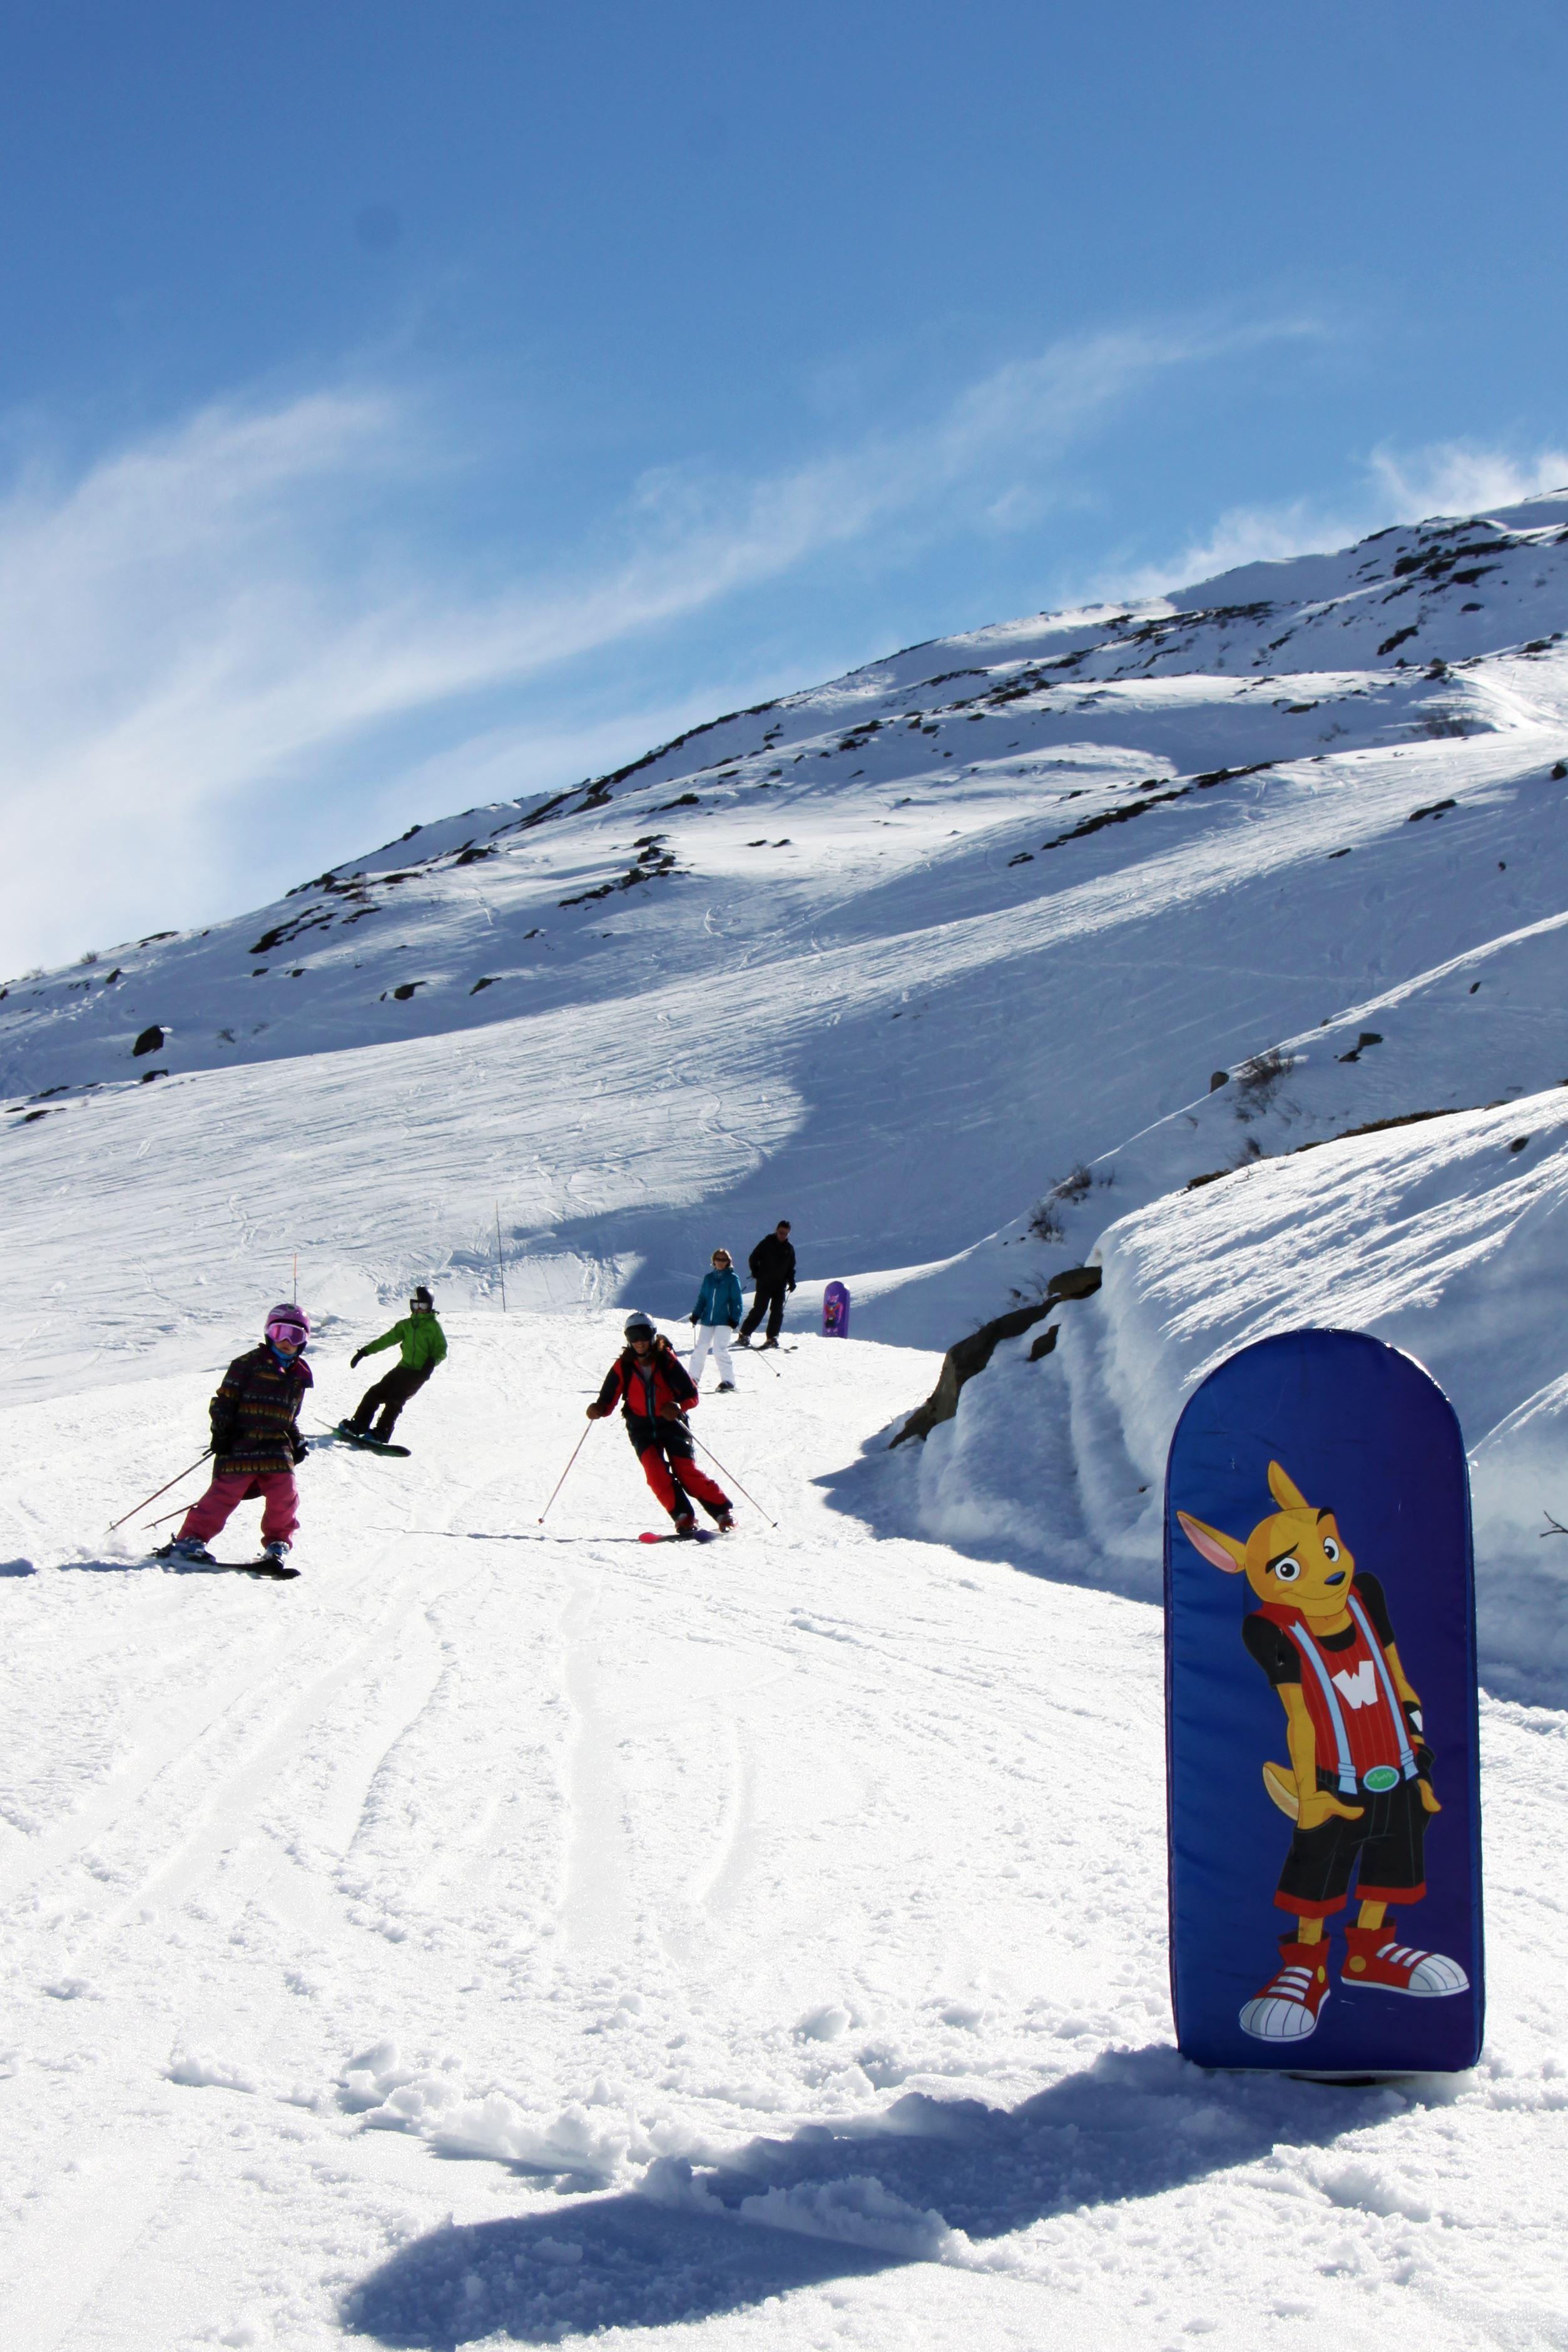 Forfaits de ski, Meilleur Prix Garanti